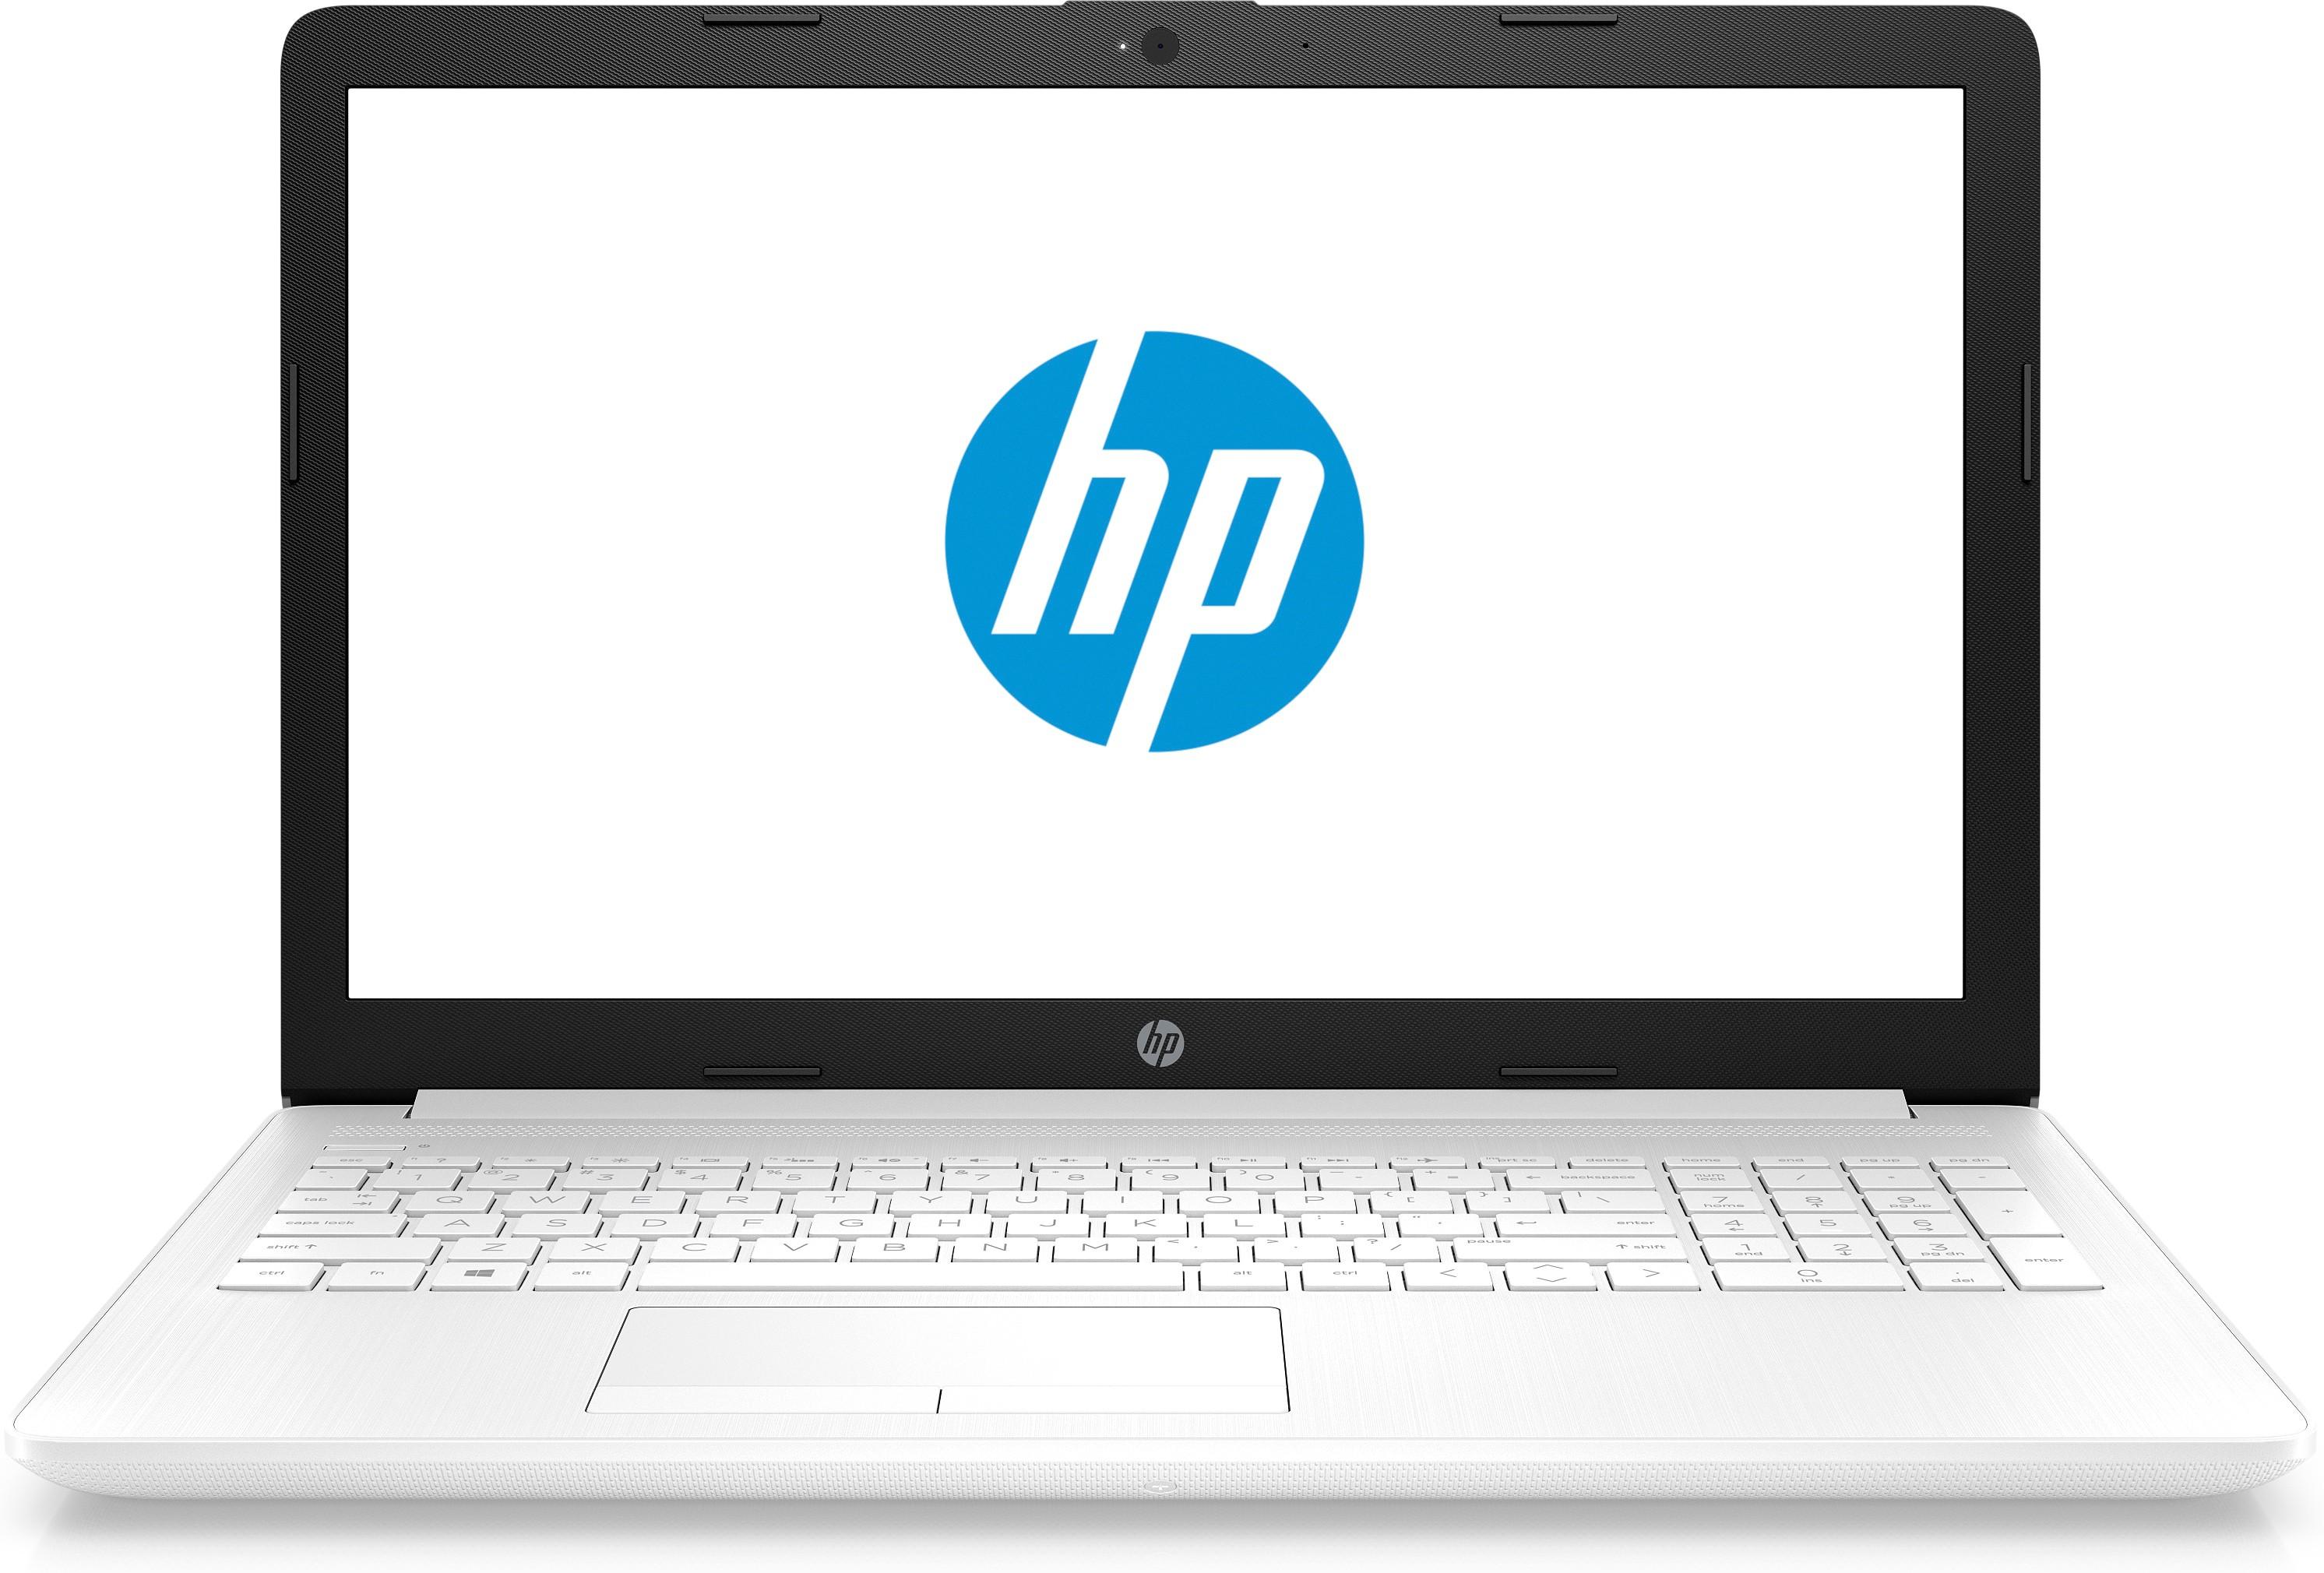 PORTATIL  HP I7 15-DA0070NS 8550U 8GB 256SSD 15.6 HDMI BT W10 BLANCO 3ZU38EA